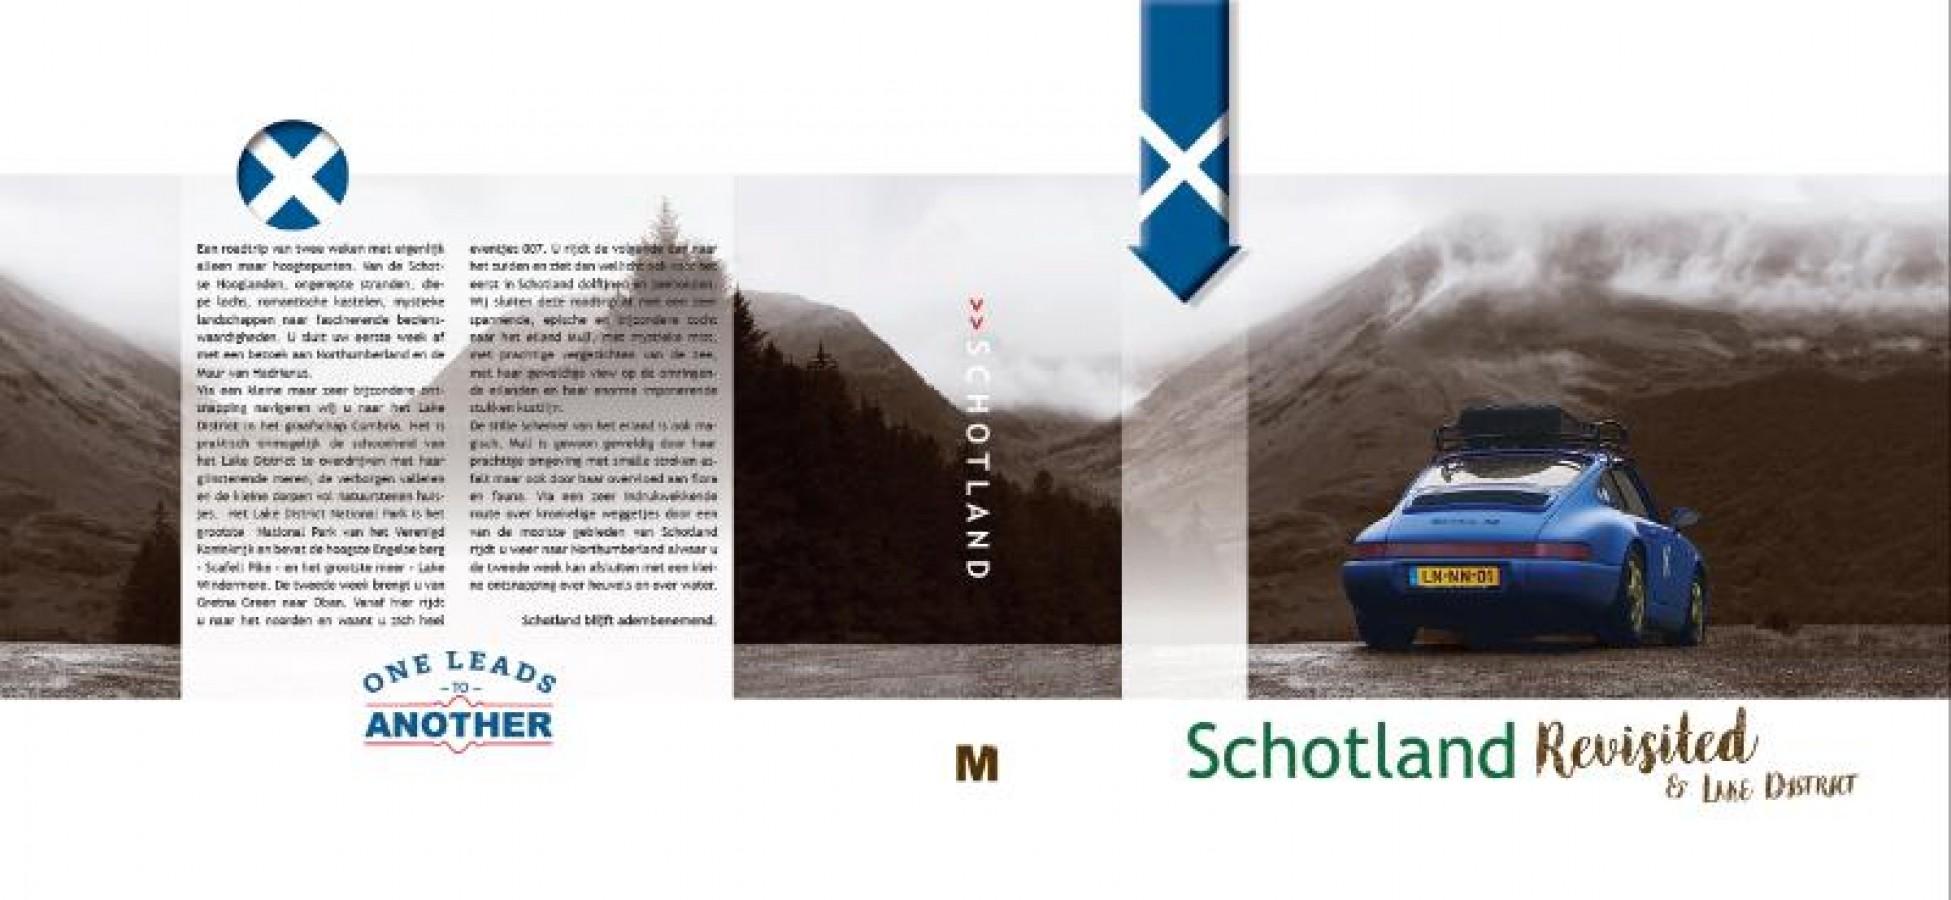 Schotland revisited